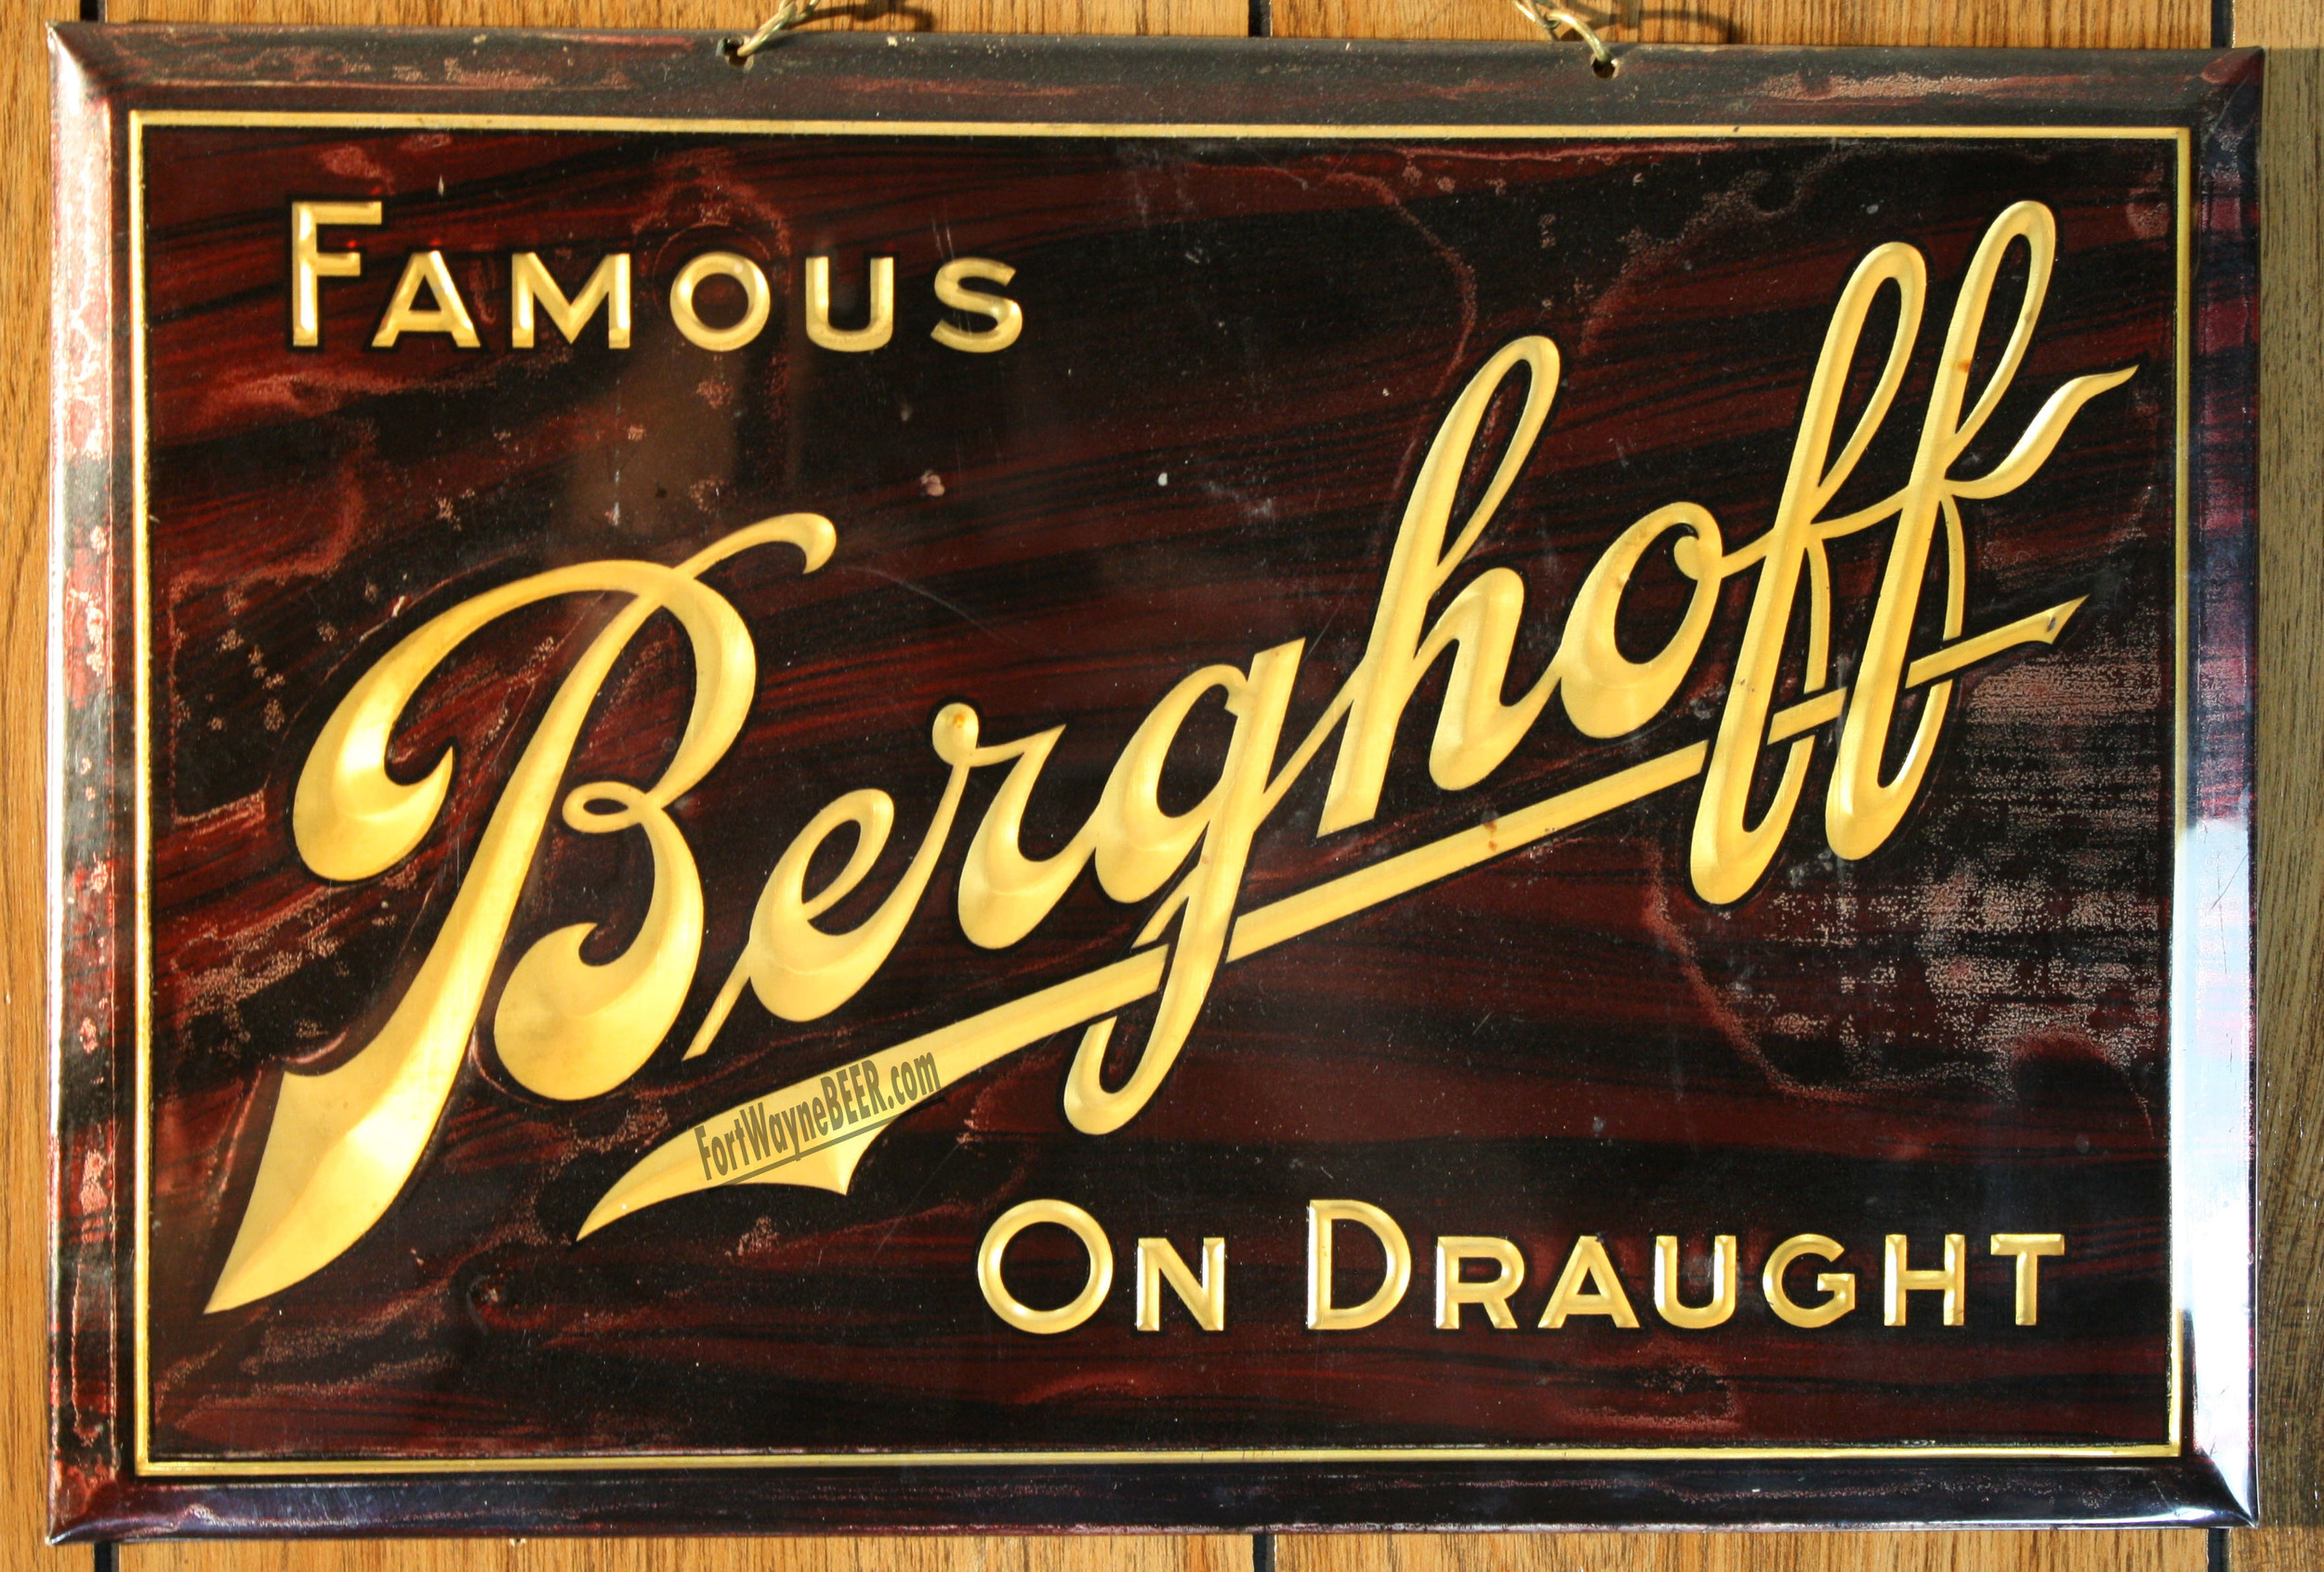 Berghoff sign 16 copy.jpg